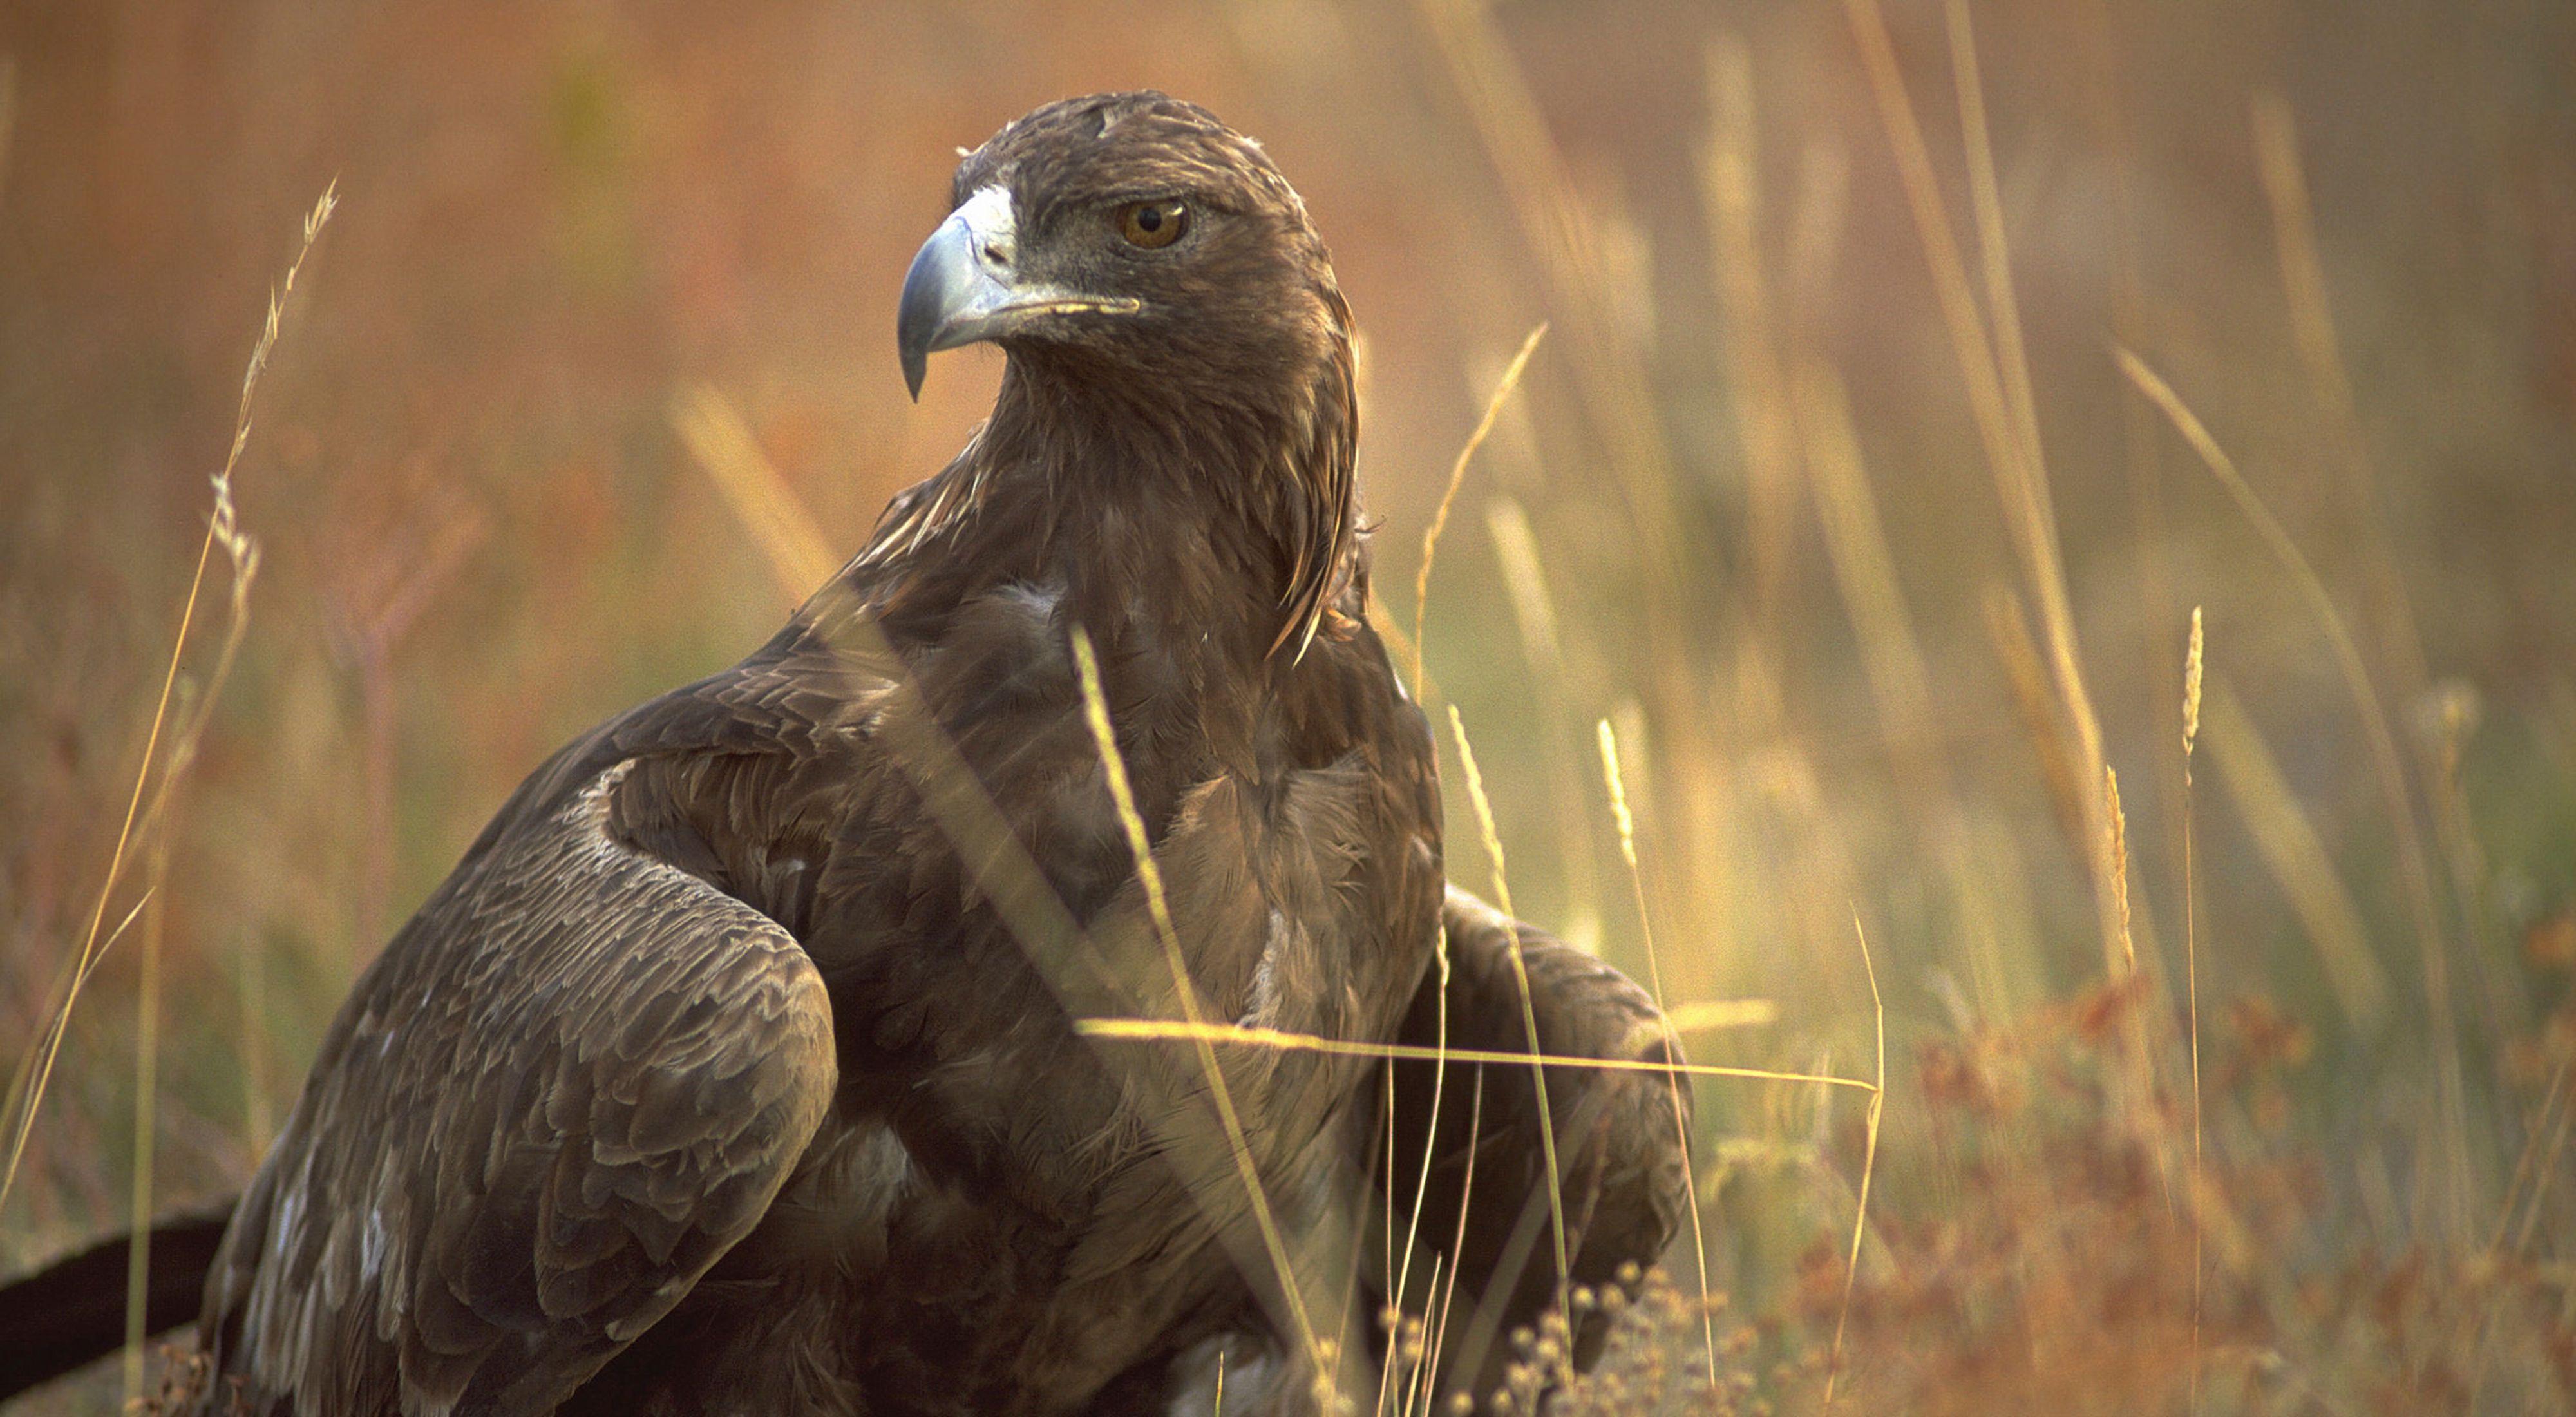 Golden eagle at Zumwalt Prairie in Oregon